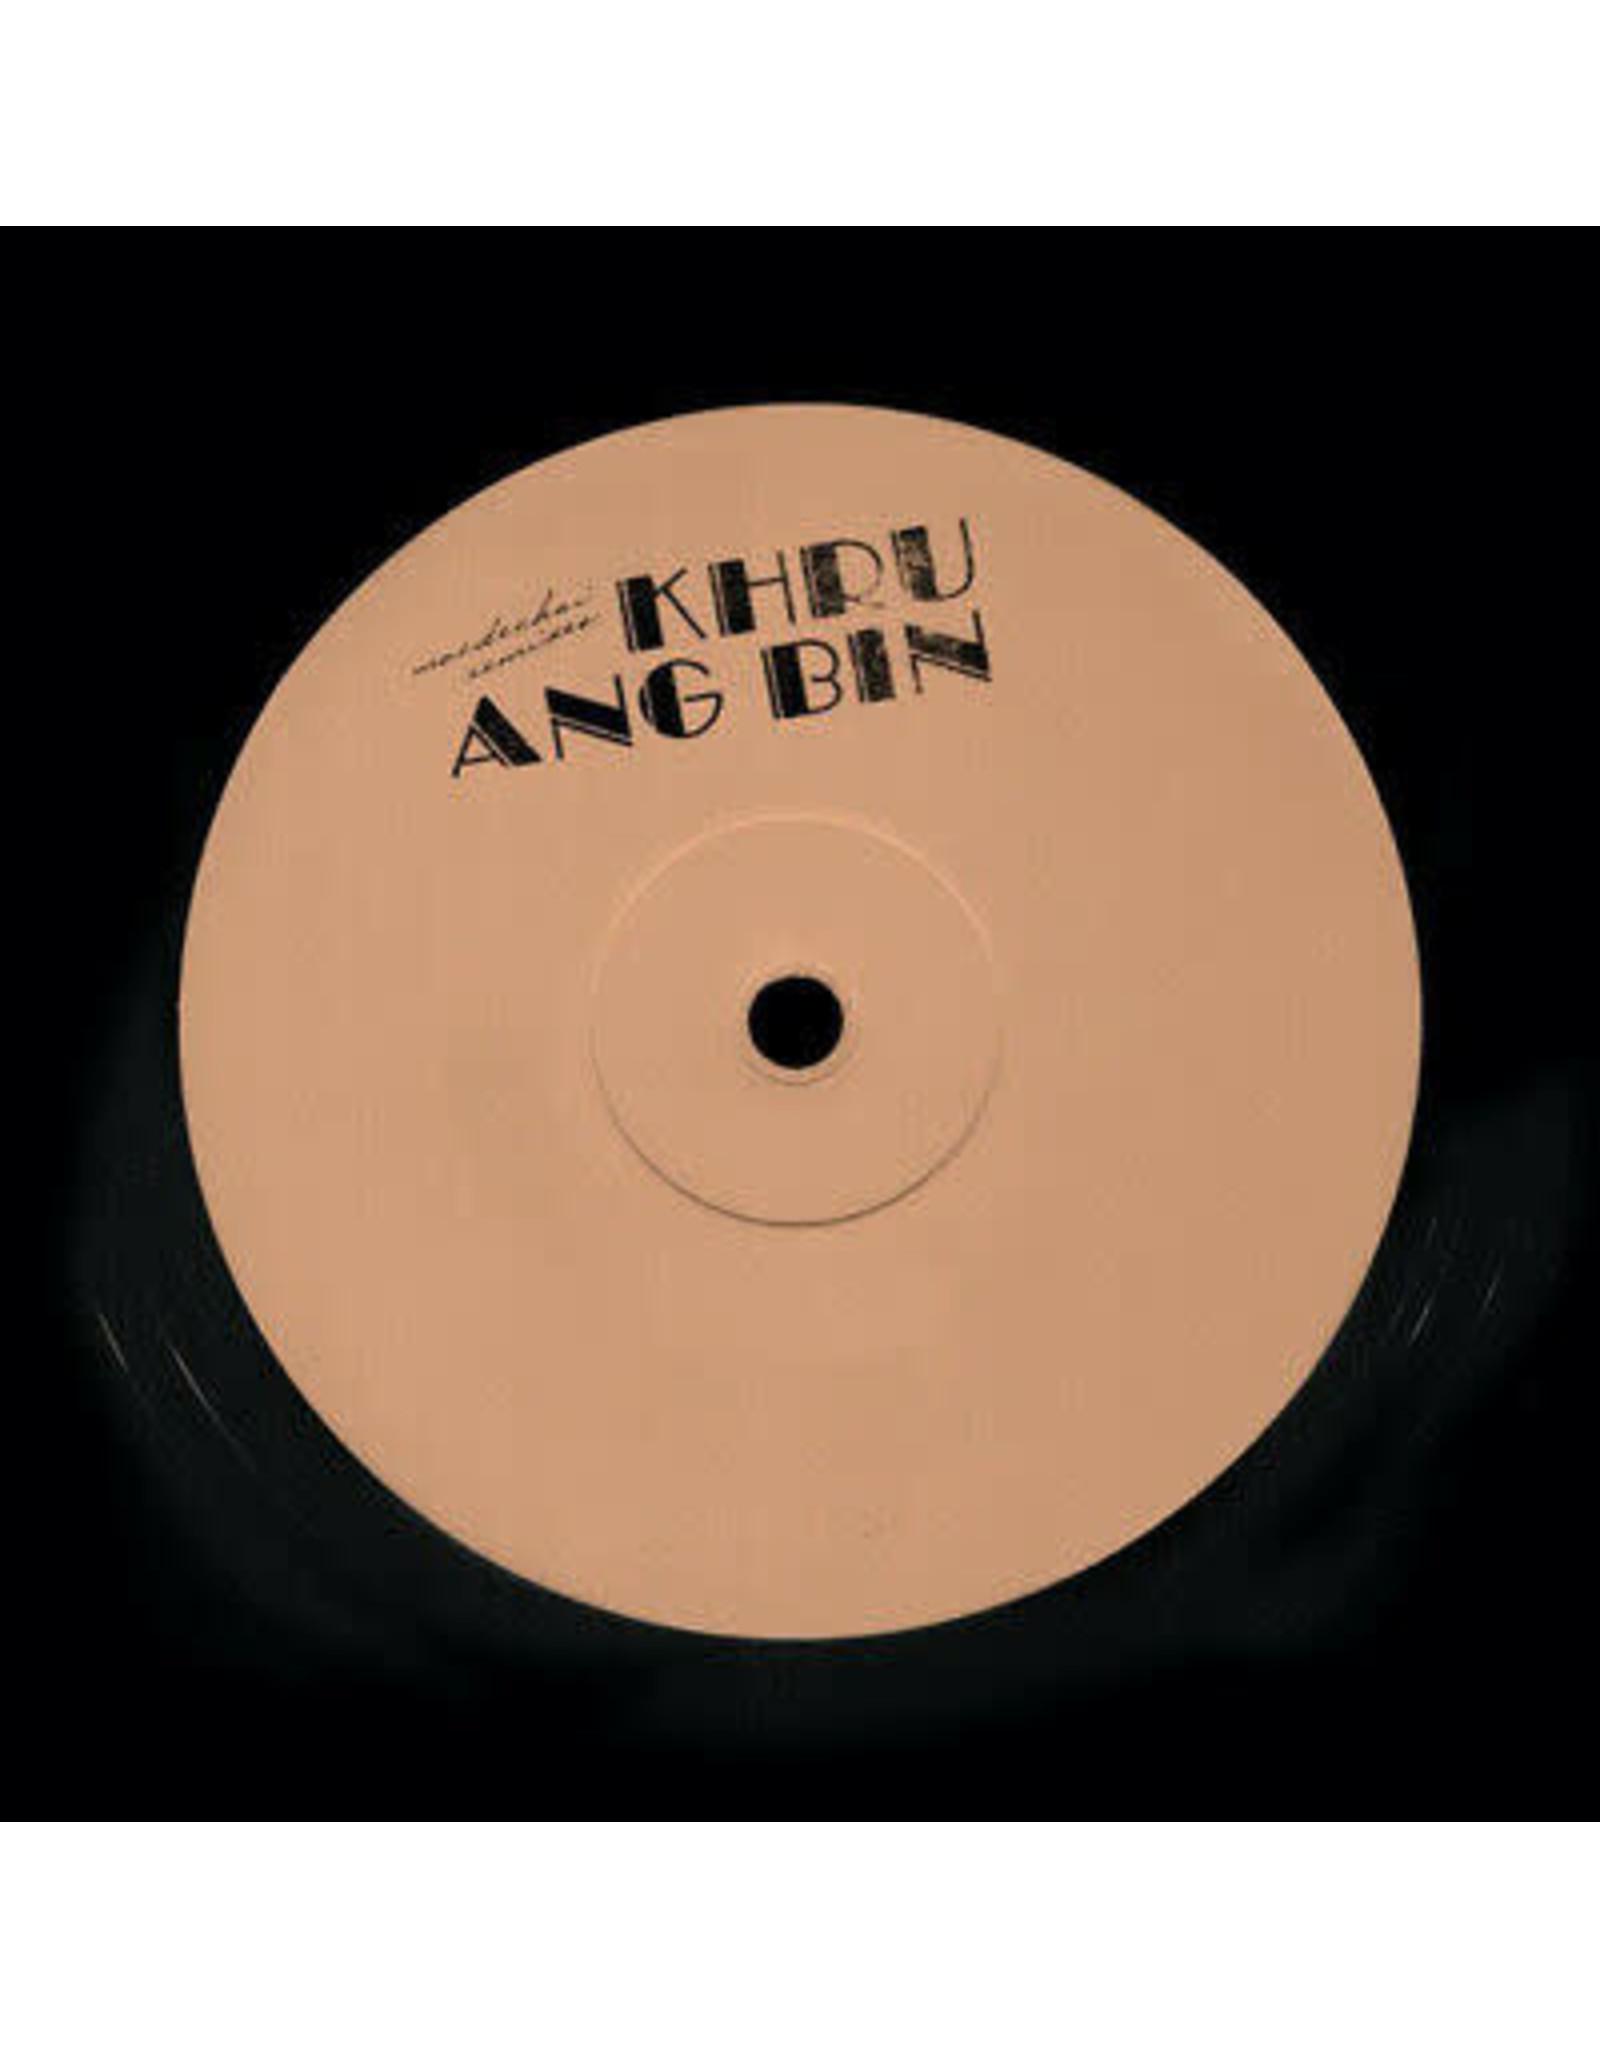 "KhruangbinPelota/Time (You And I) (Remixes) 12"" (pink label)"